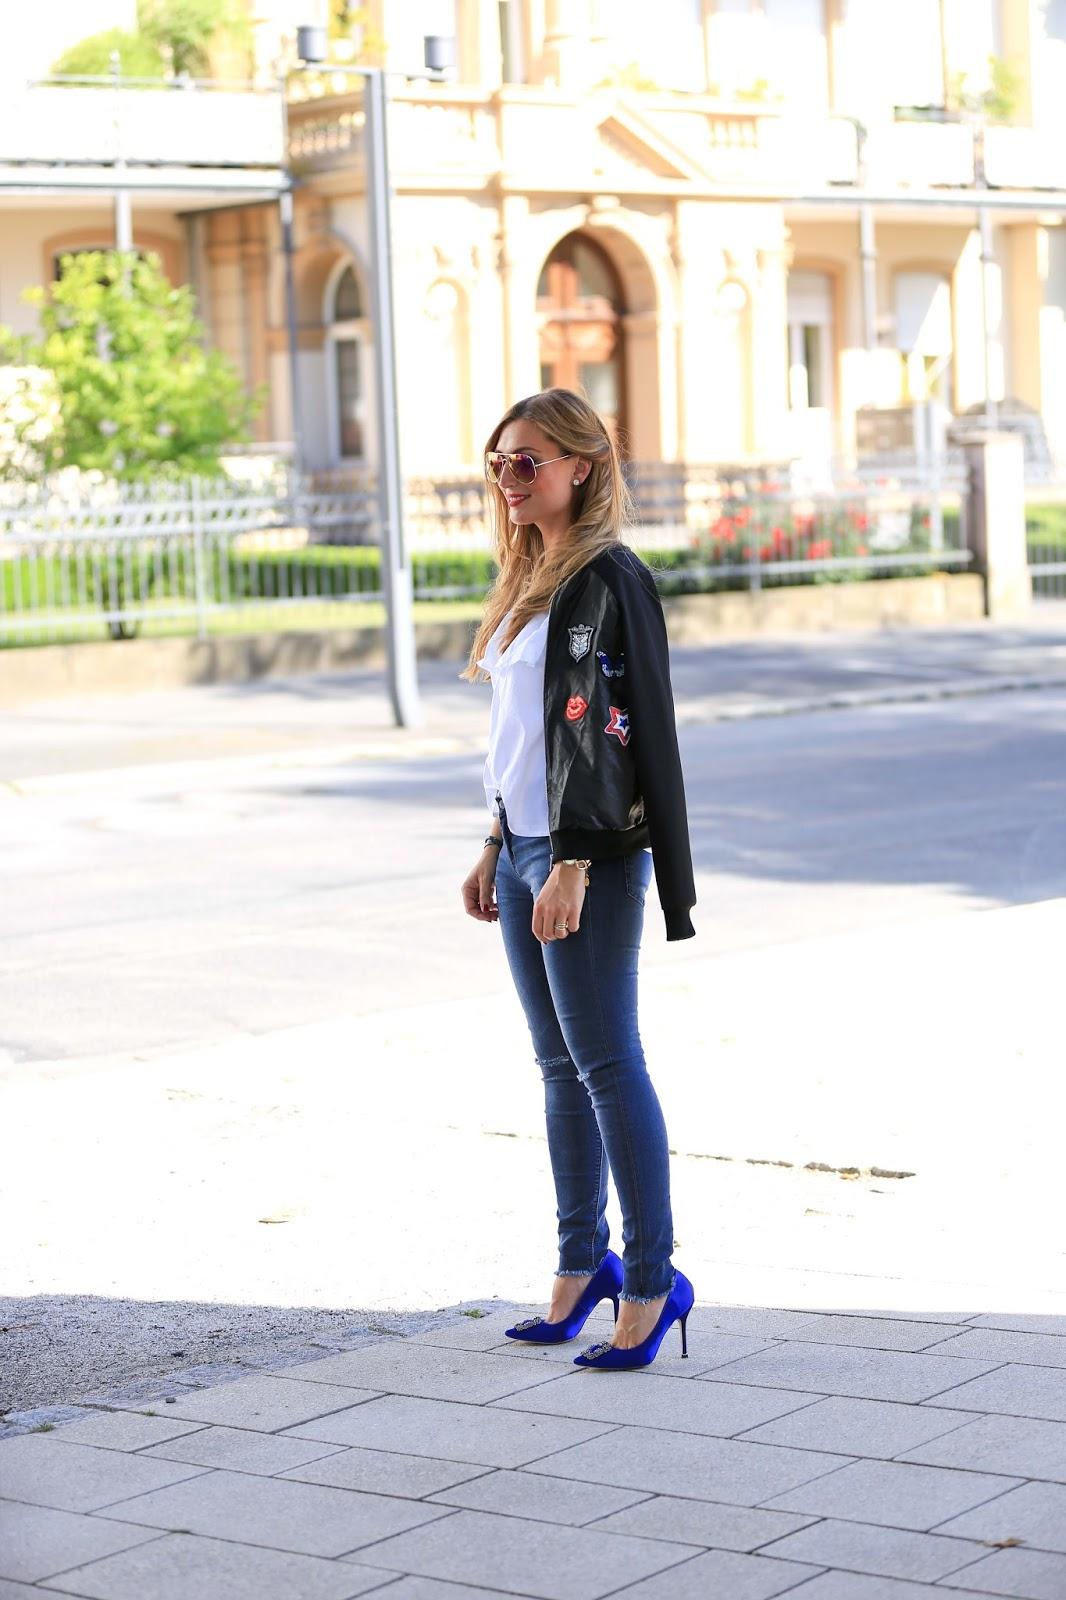 -fashionblog-muenchen-styleblog-Frankfurth-blogger-deutschland-fashionblogger-bloggerdeutschland-Fashionstylebyjohanna - Sheinside Look -lifestyleblog-modeblog-germanblogger-blaue Pumps